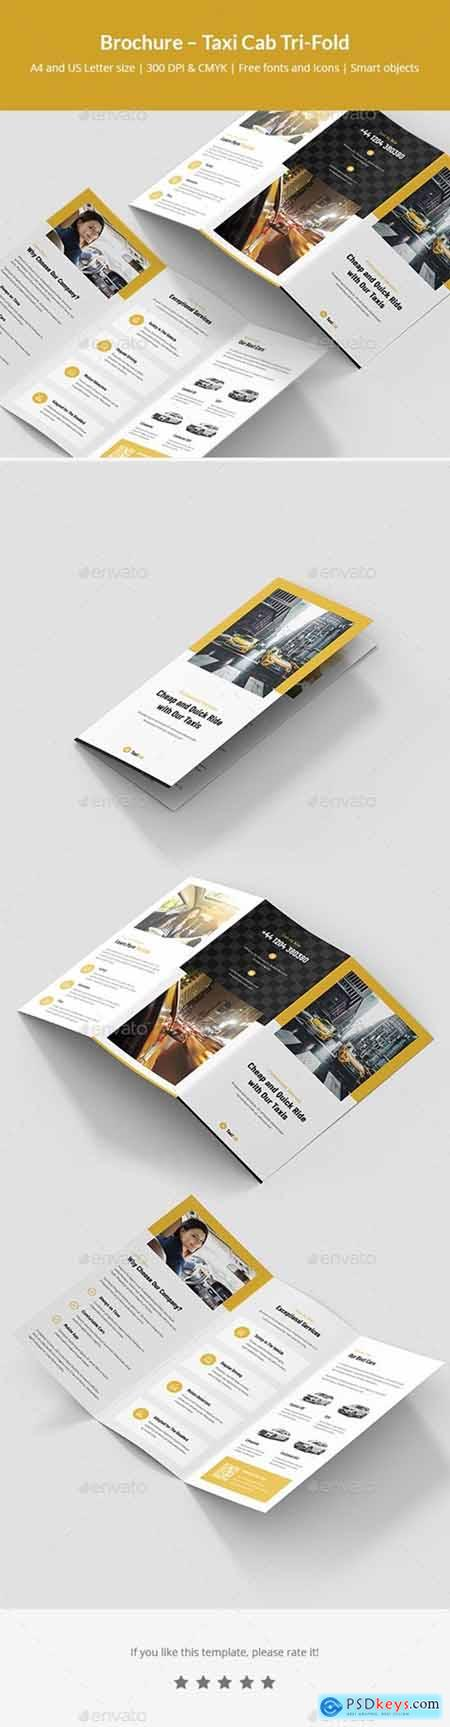 Brochure – Taxi Cab Tri-Fold 24819420